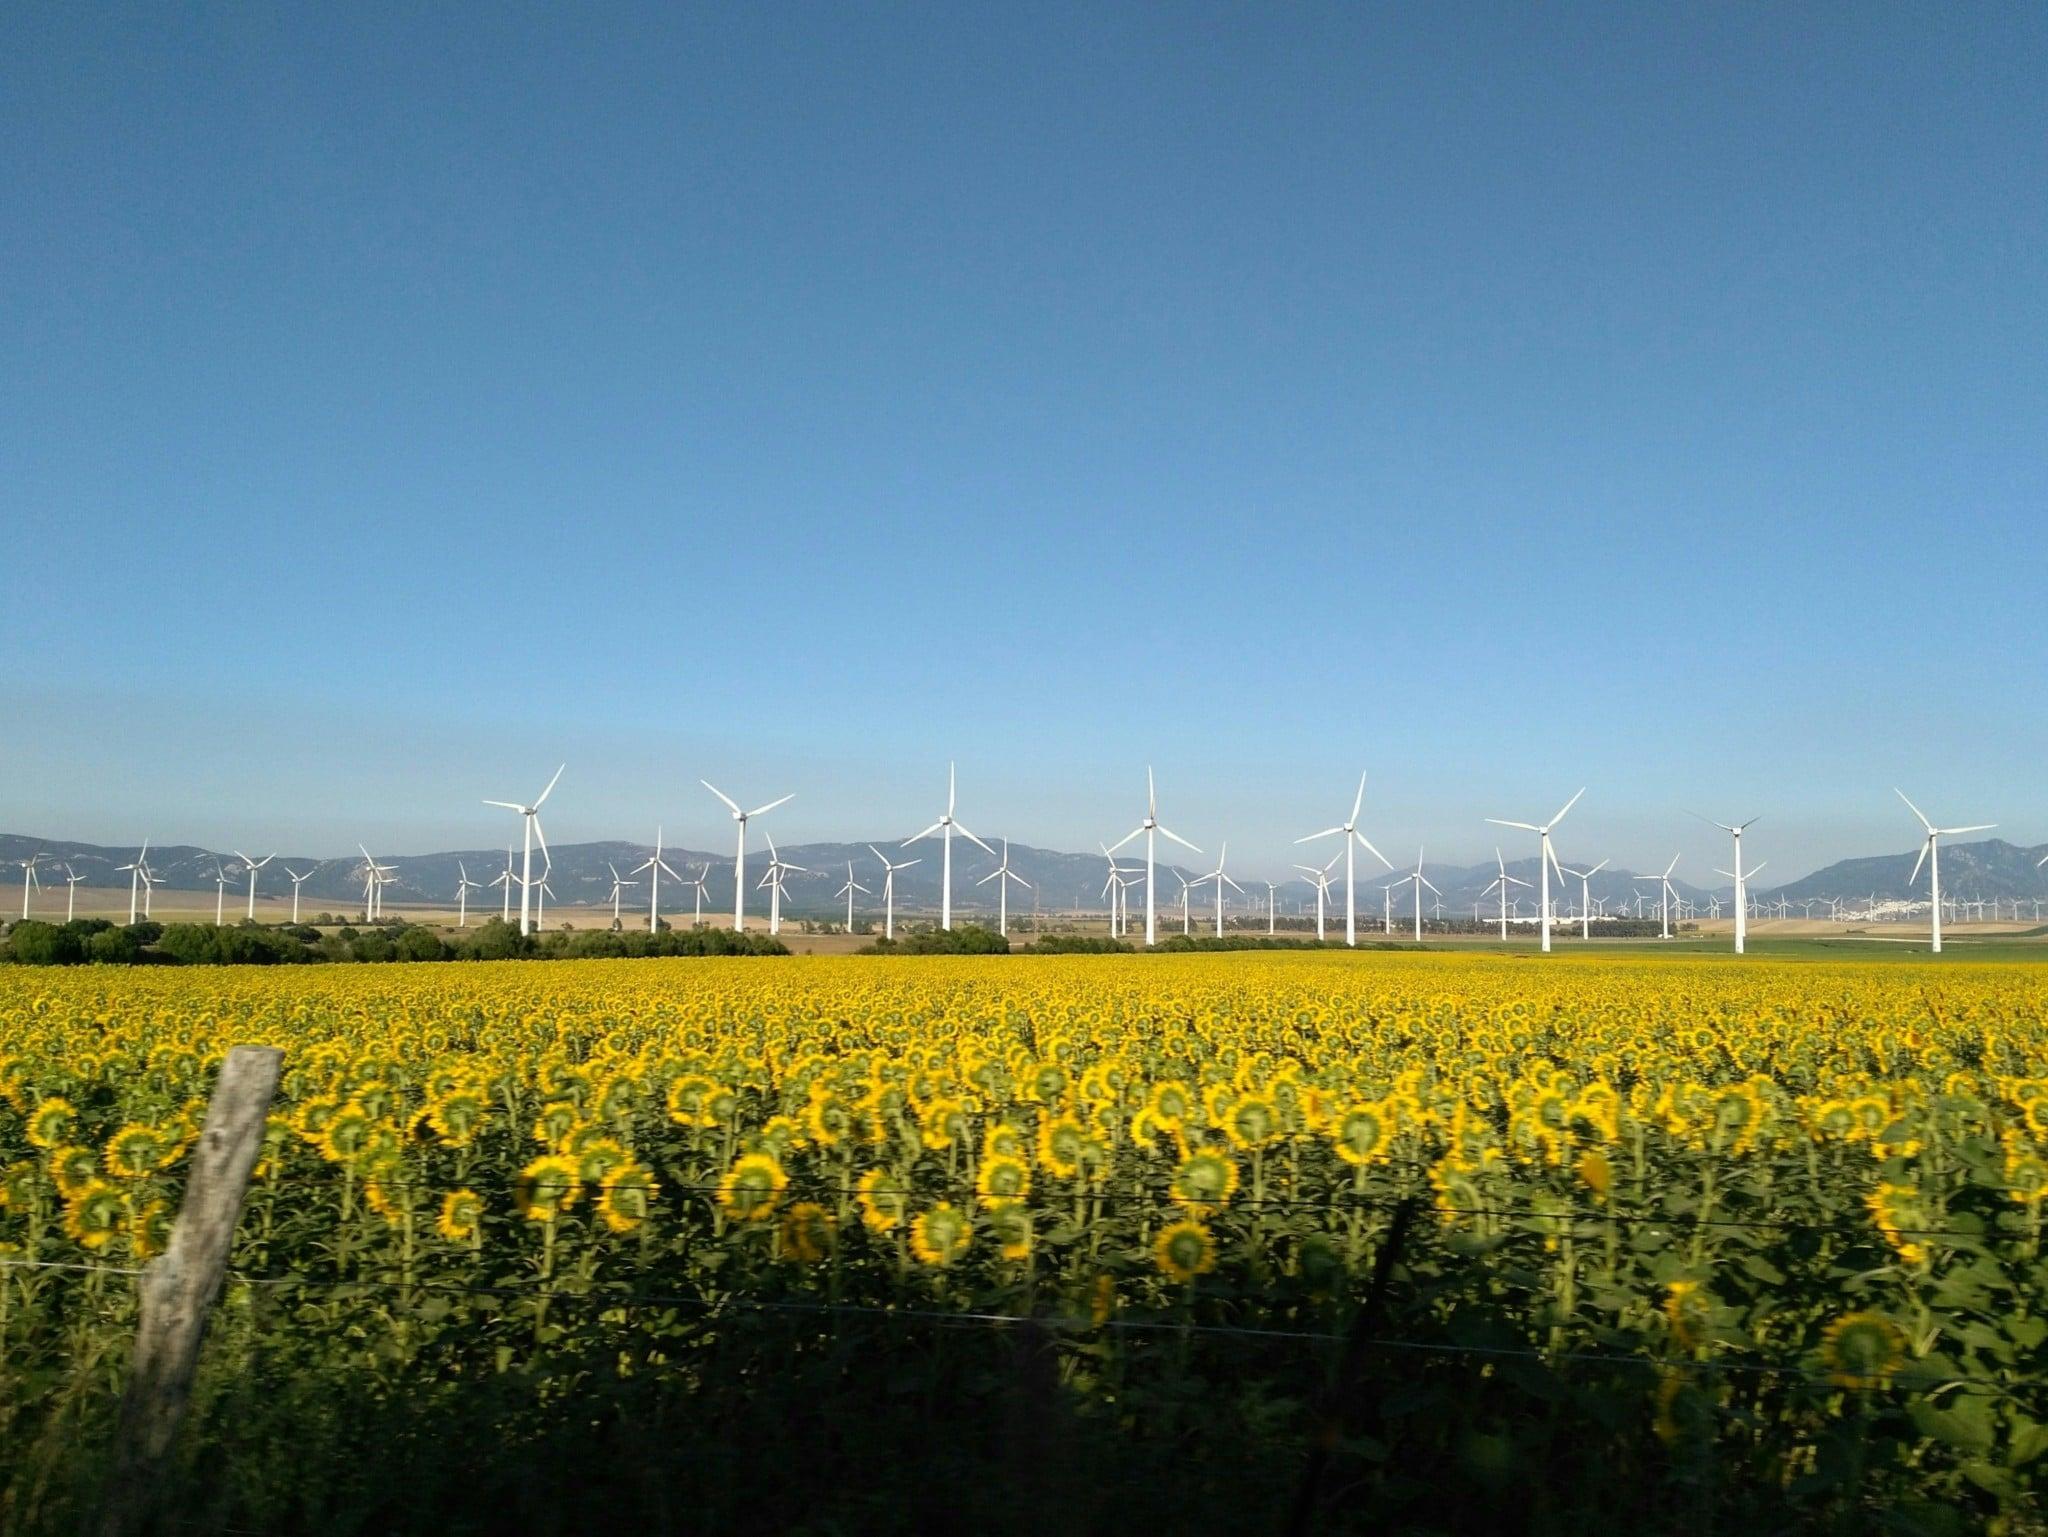 johanna montoya 483038 unsplash 1 Moixa | Home Energy Storage | Smart Energy Management